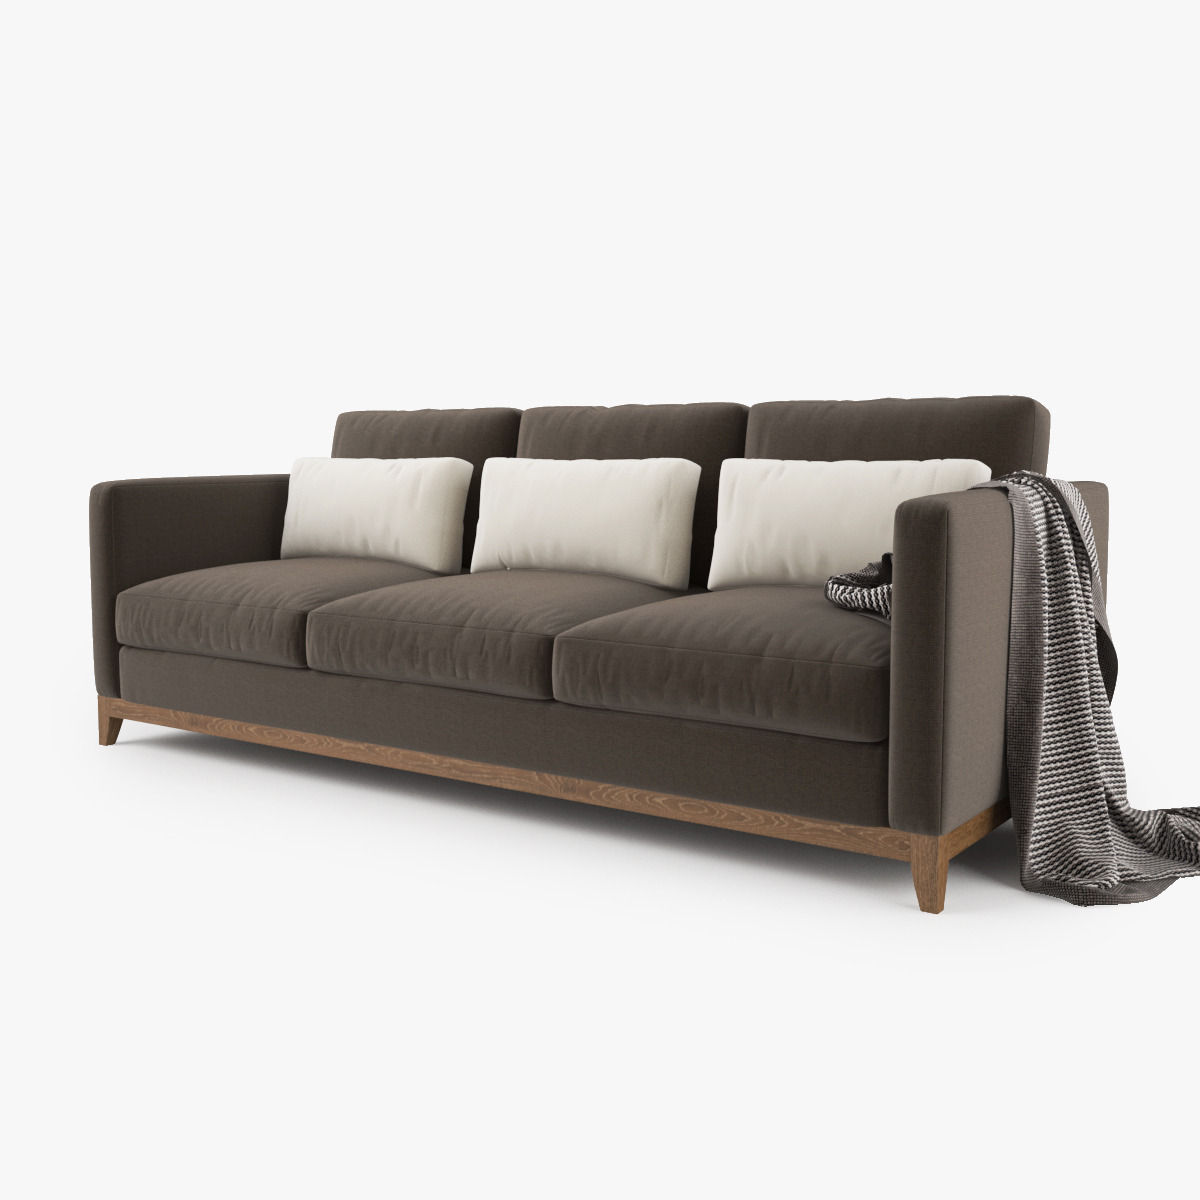 Crate And Barrel Taraval 3 Seat Sofa Model